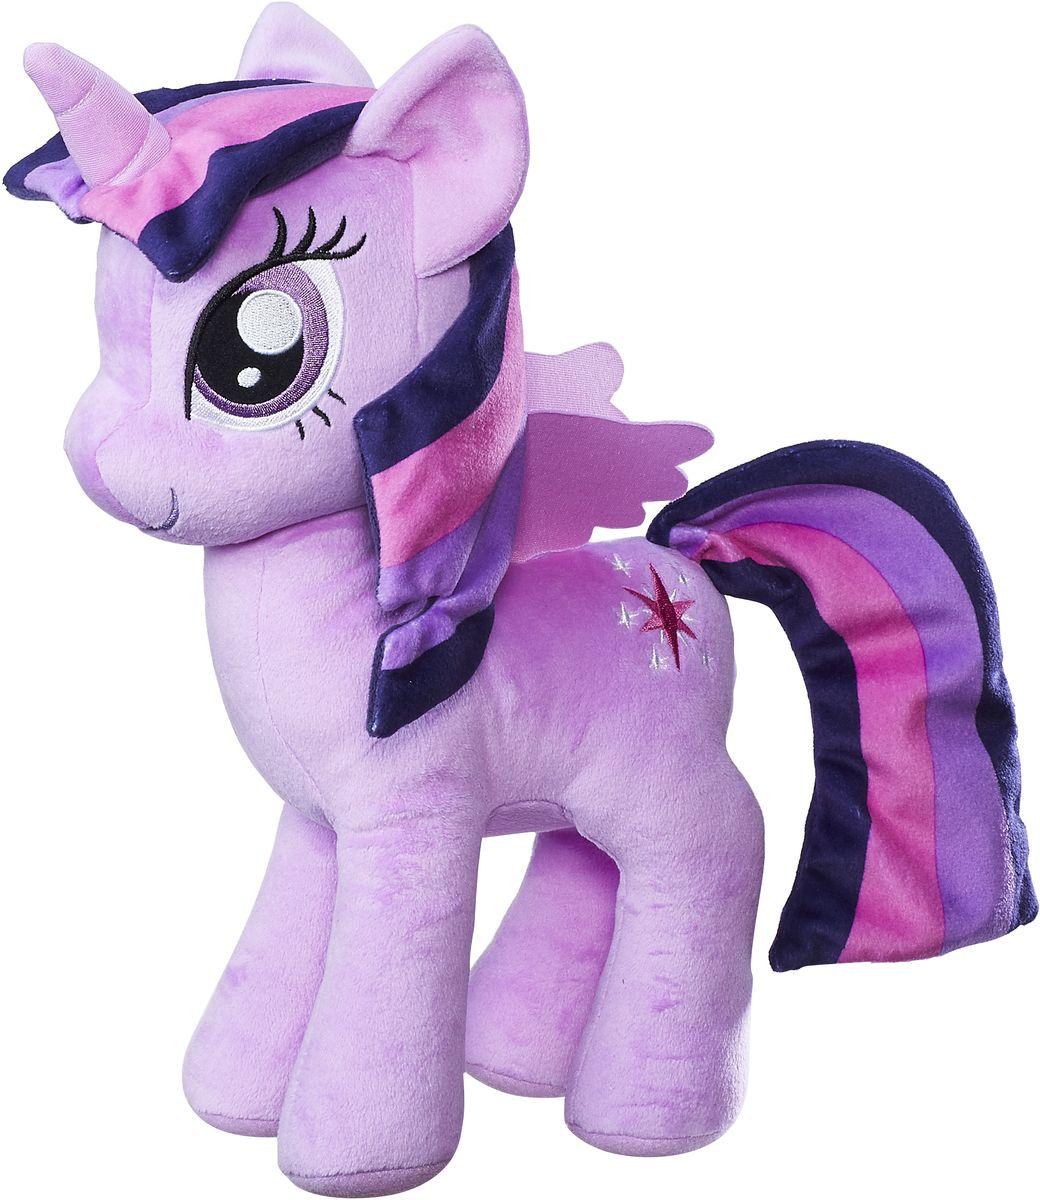 My Little Pony Мягкая игрушка Плюшевые пони Твайлайт Спаркл 30 см мини фигурка my little pony твайлайт спаркл